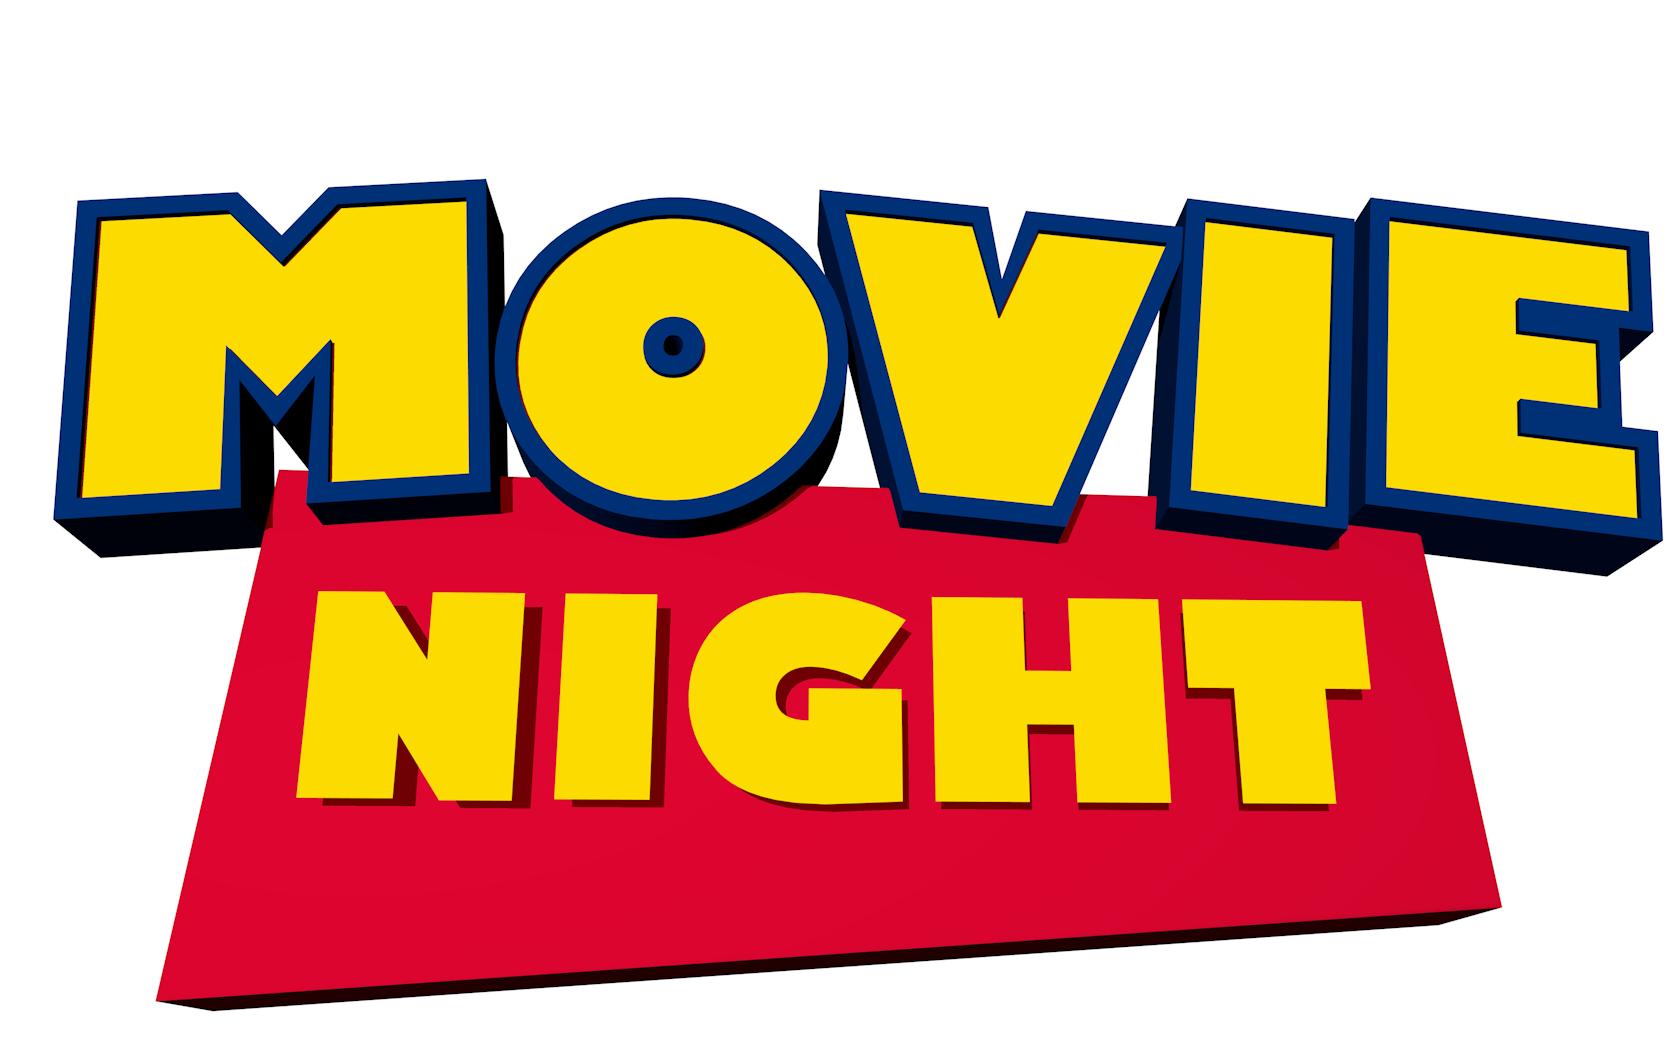 Cinema clipart film screening. Night child movie png